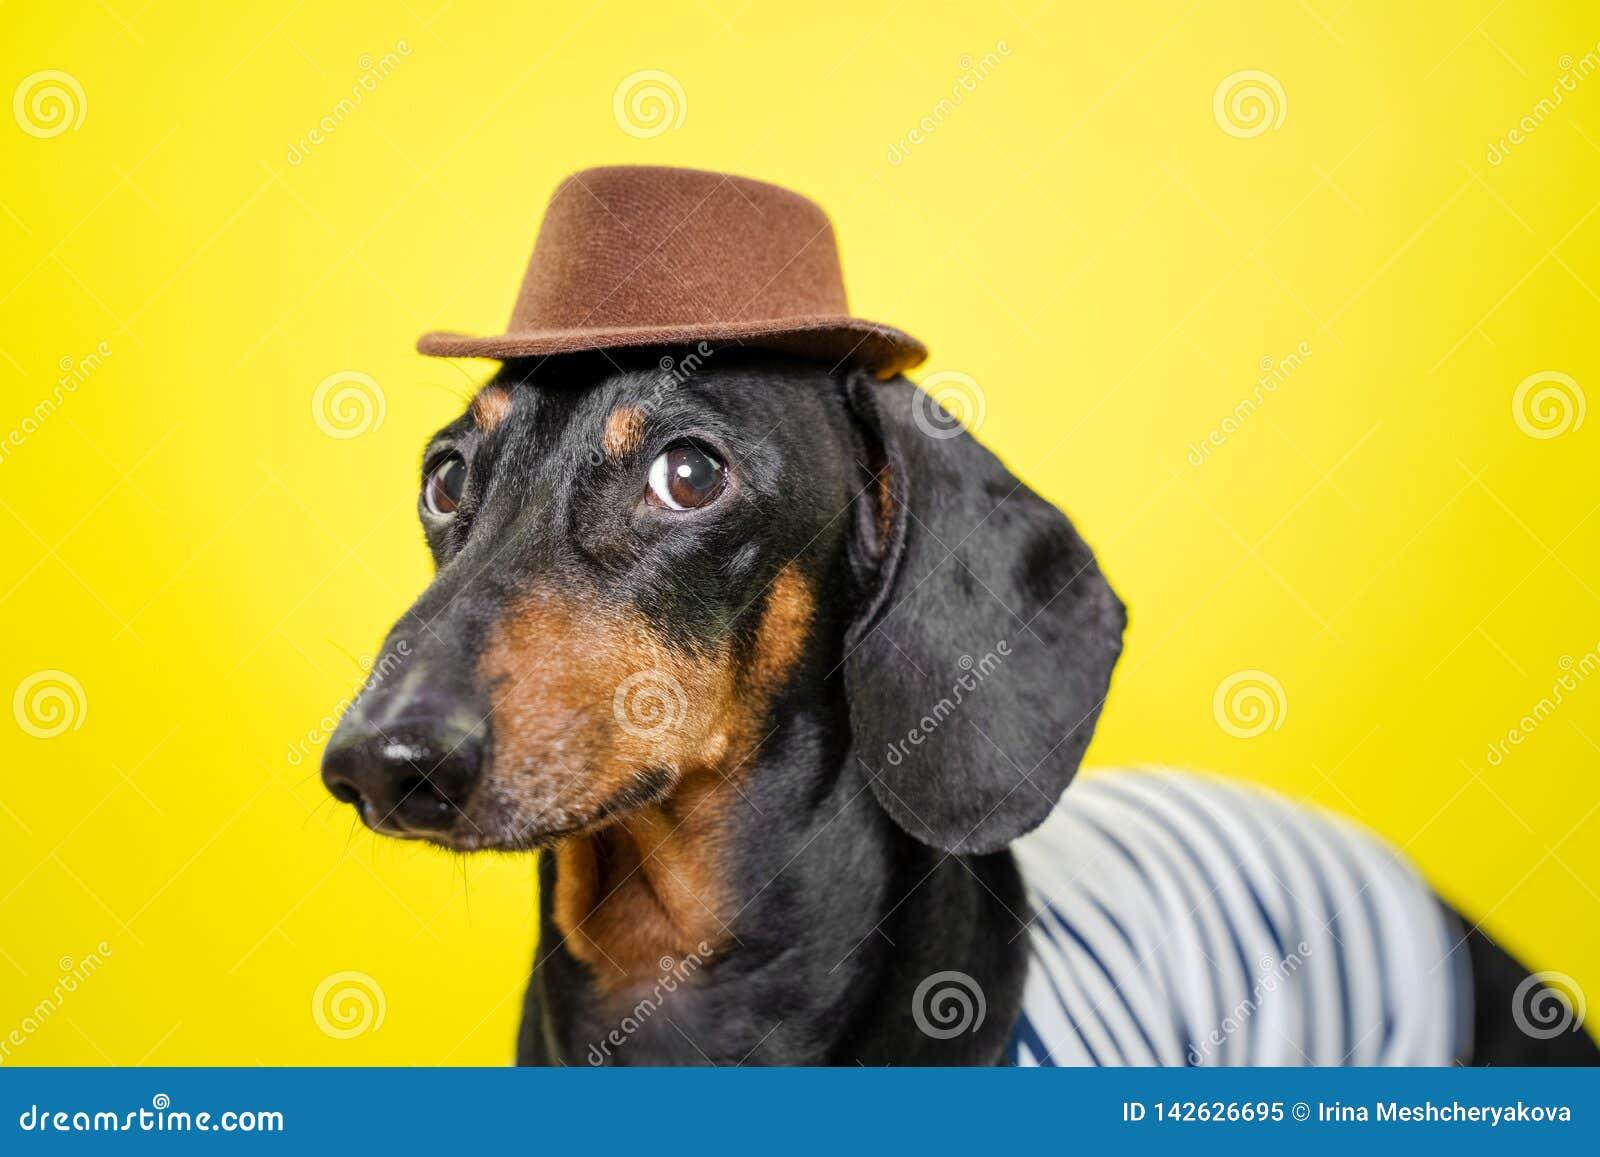 Beautiful Breed Dachshund Dog, Black